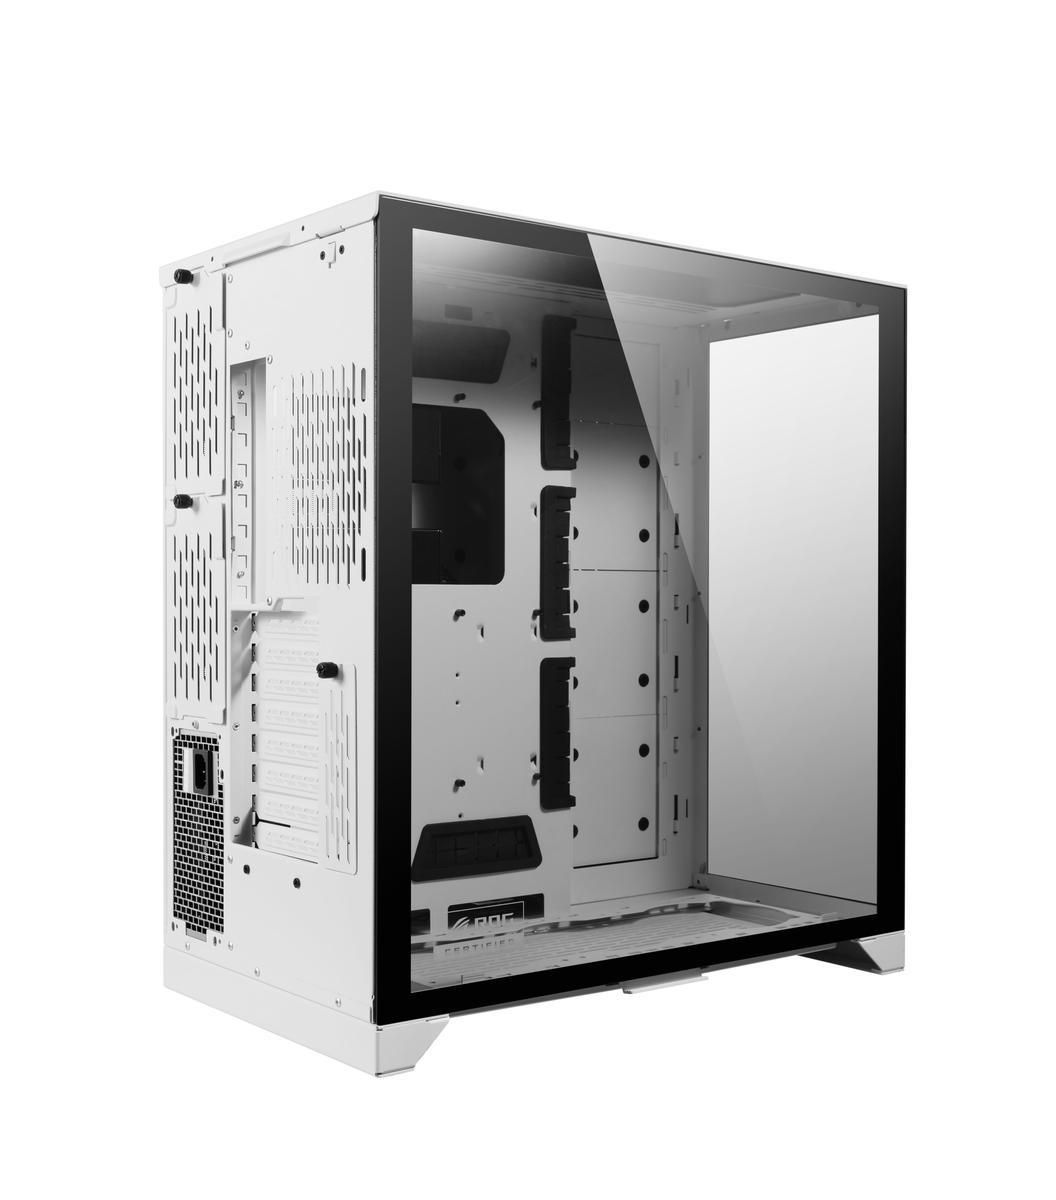 Lian Li O11D XL-W ATX Full Tower Case